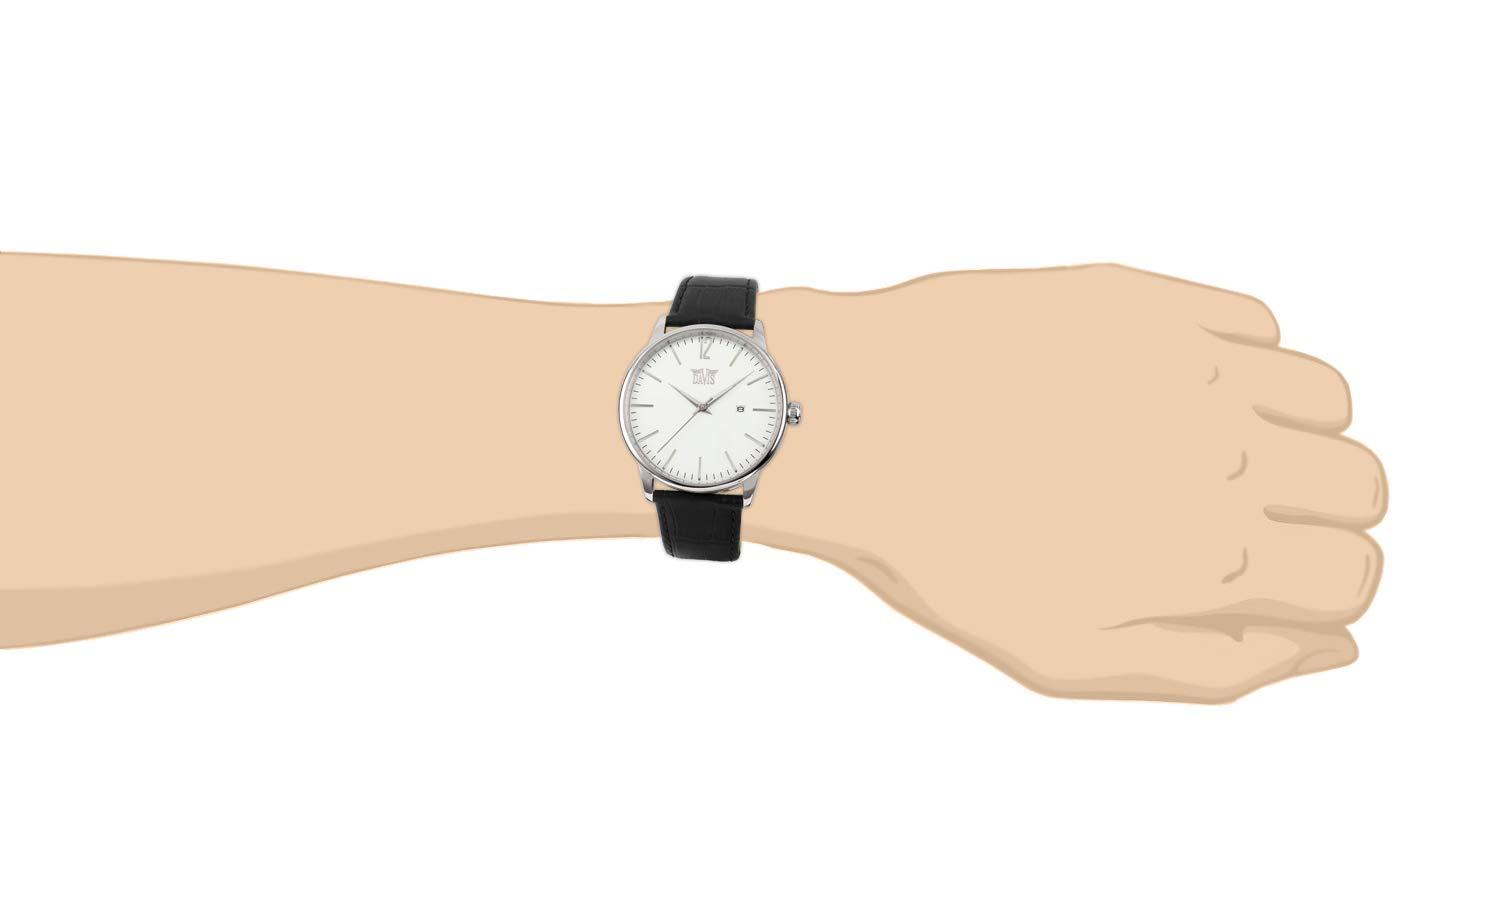 Davis-herr retro vintage klocka visat siffertavla datum Stål/svart läderarmband